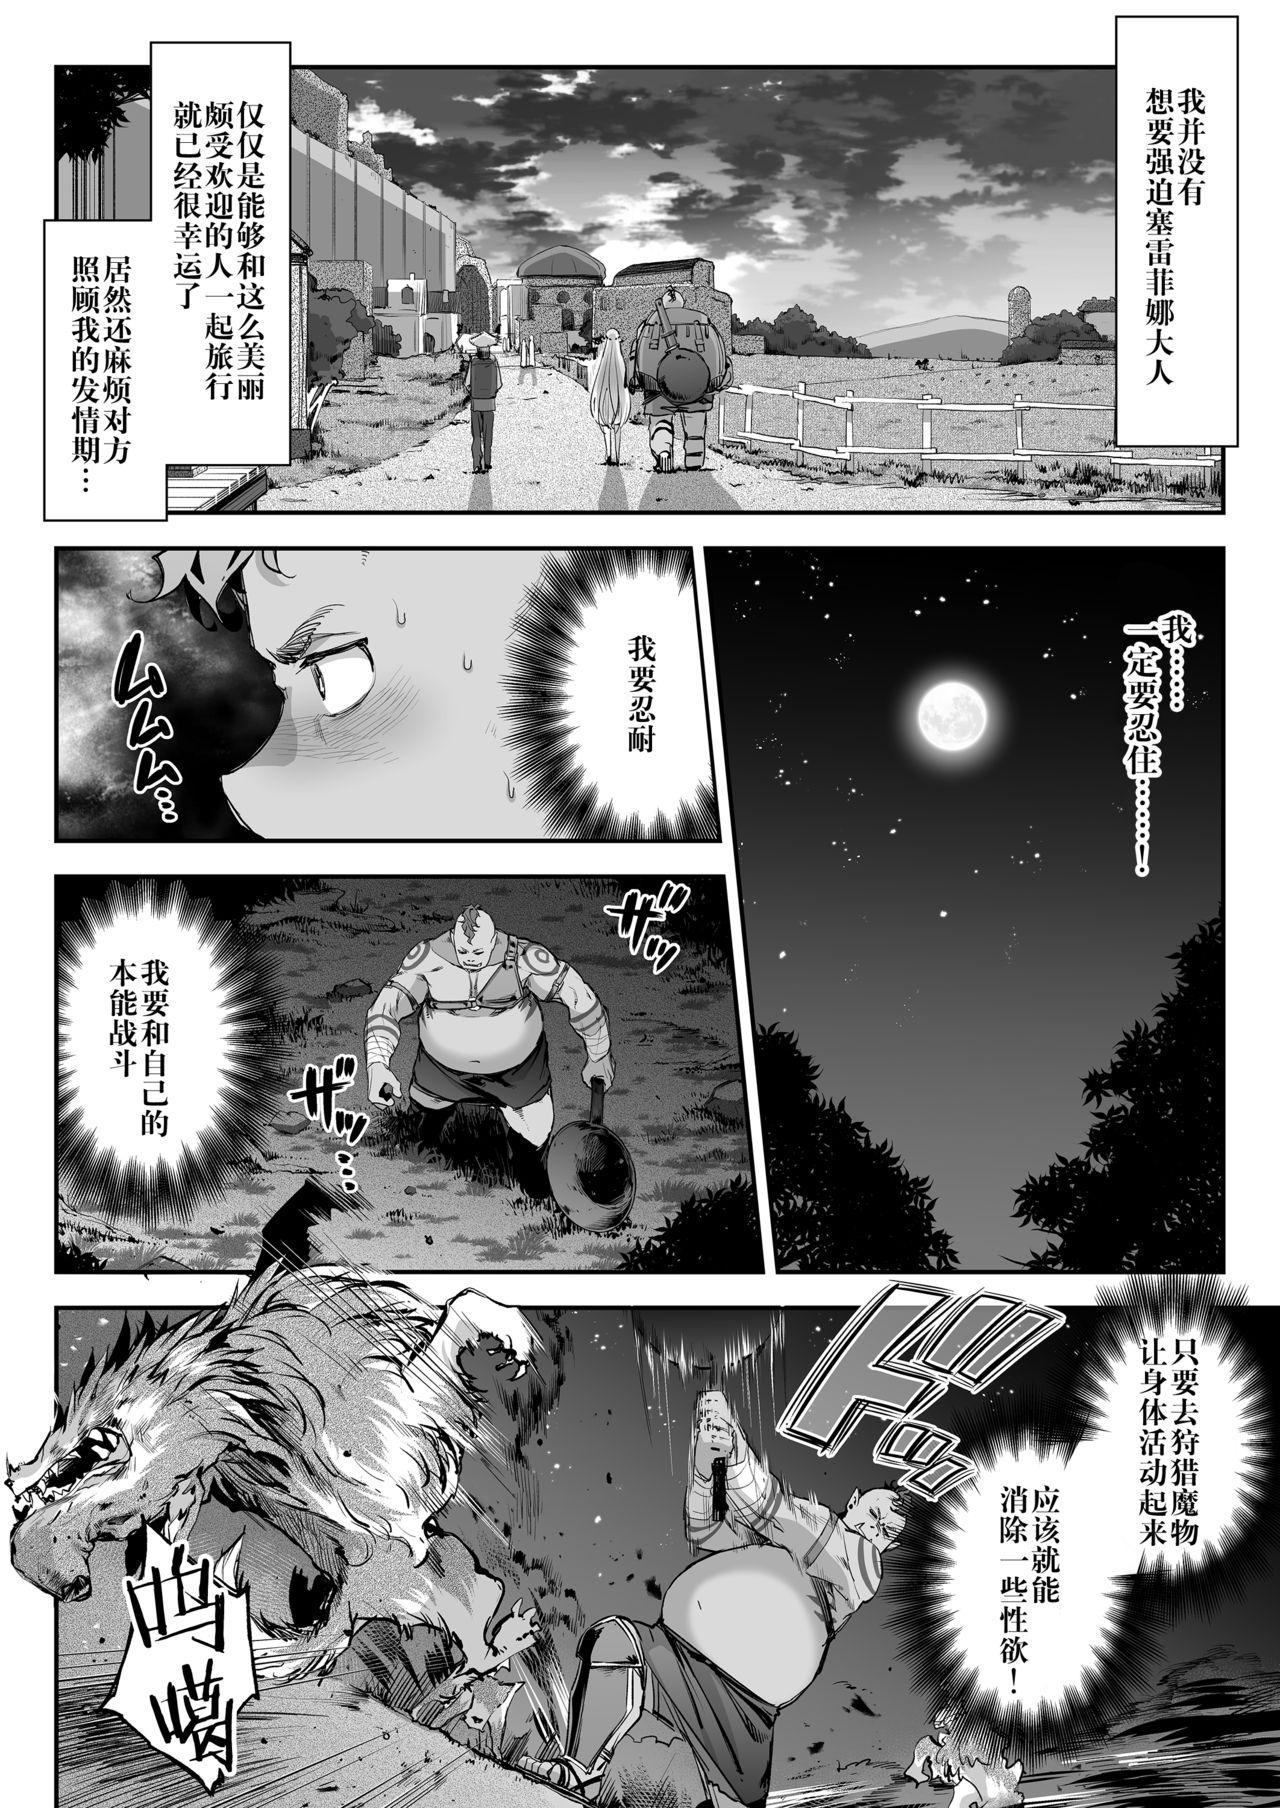 [Ichinose Land] Midara na Elf-san wa Orc-kun ga Osuki [Chinese] [新桥月白日语社] [Digital] 14